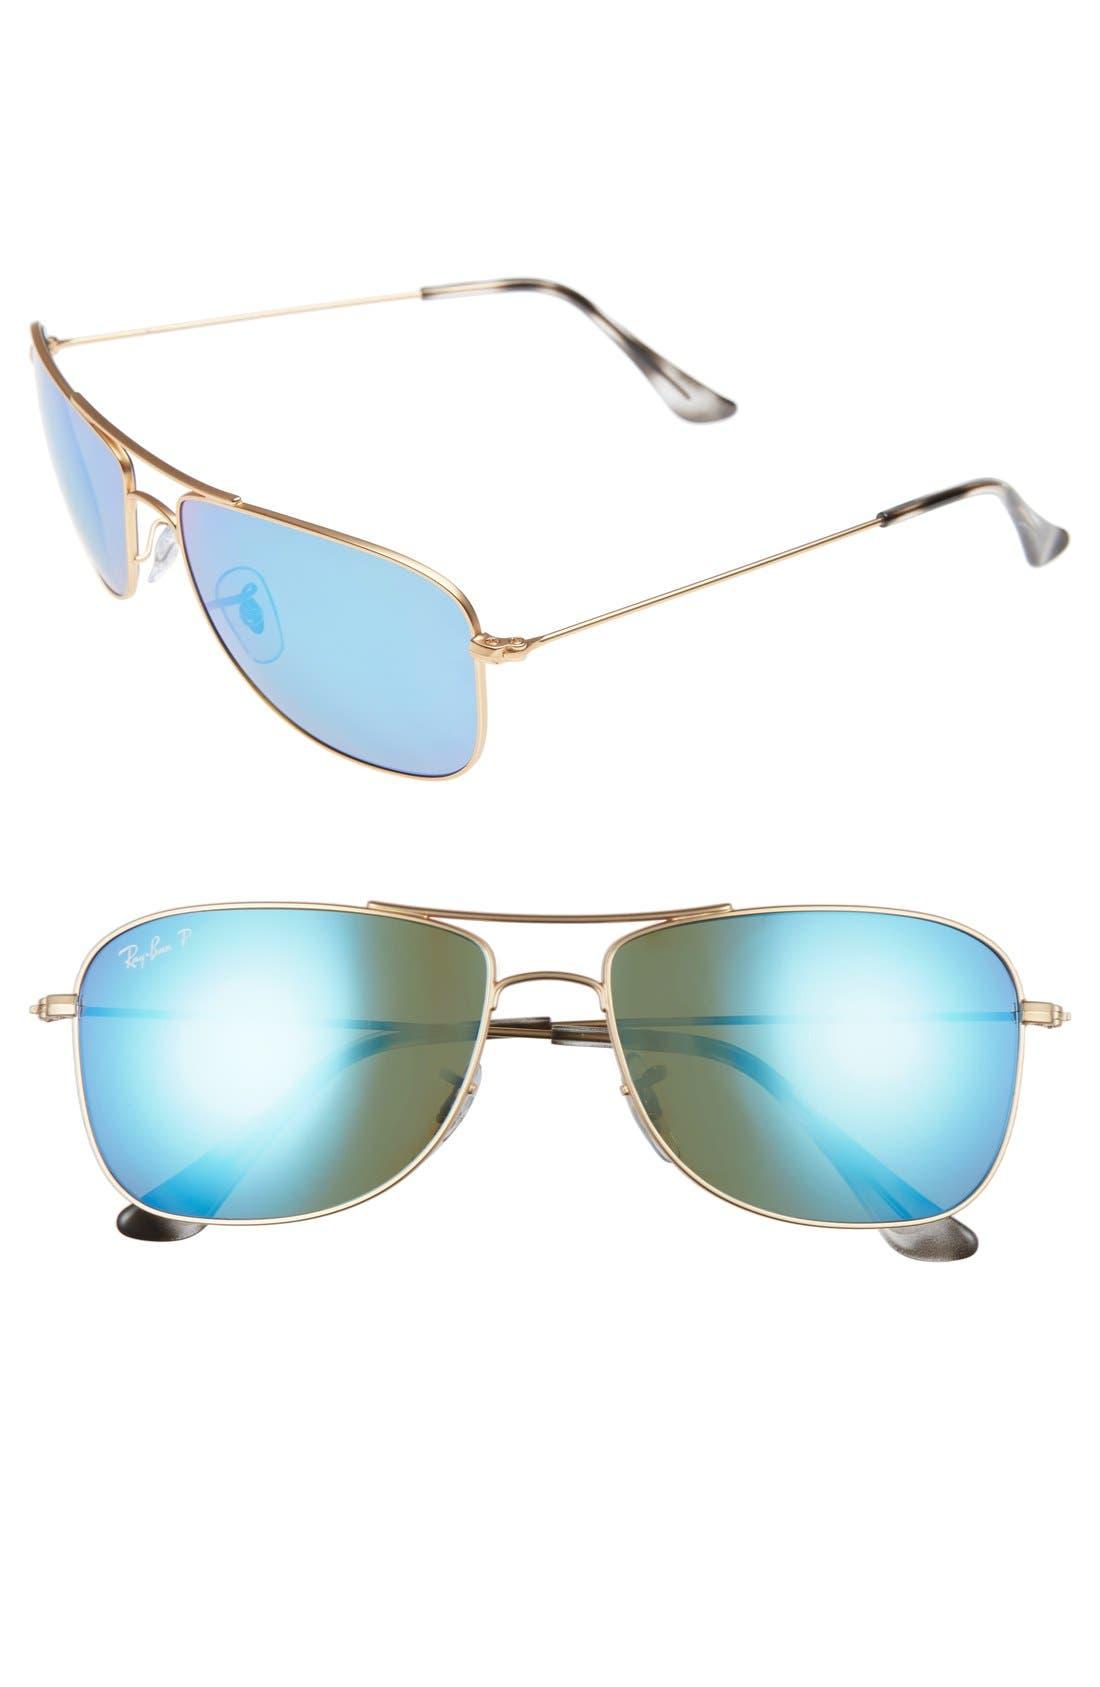 Ray-Ban Tech 59mm Polarized Sunglasses